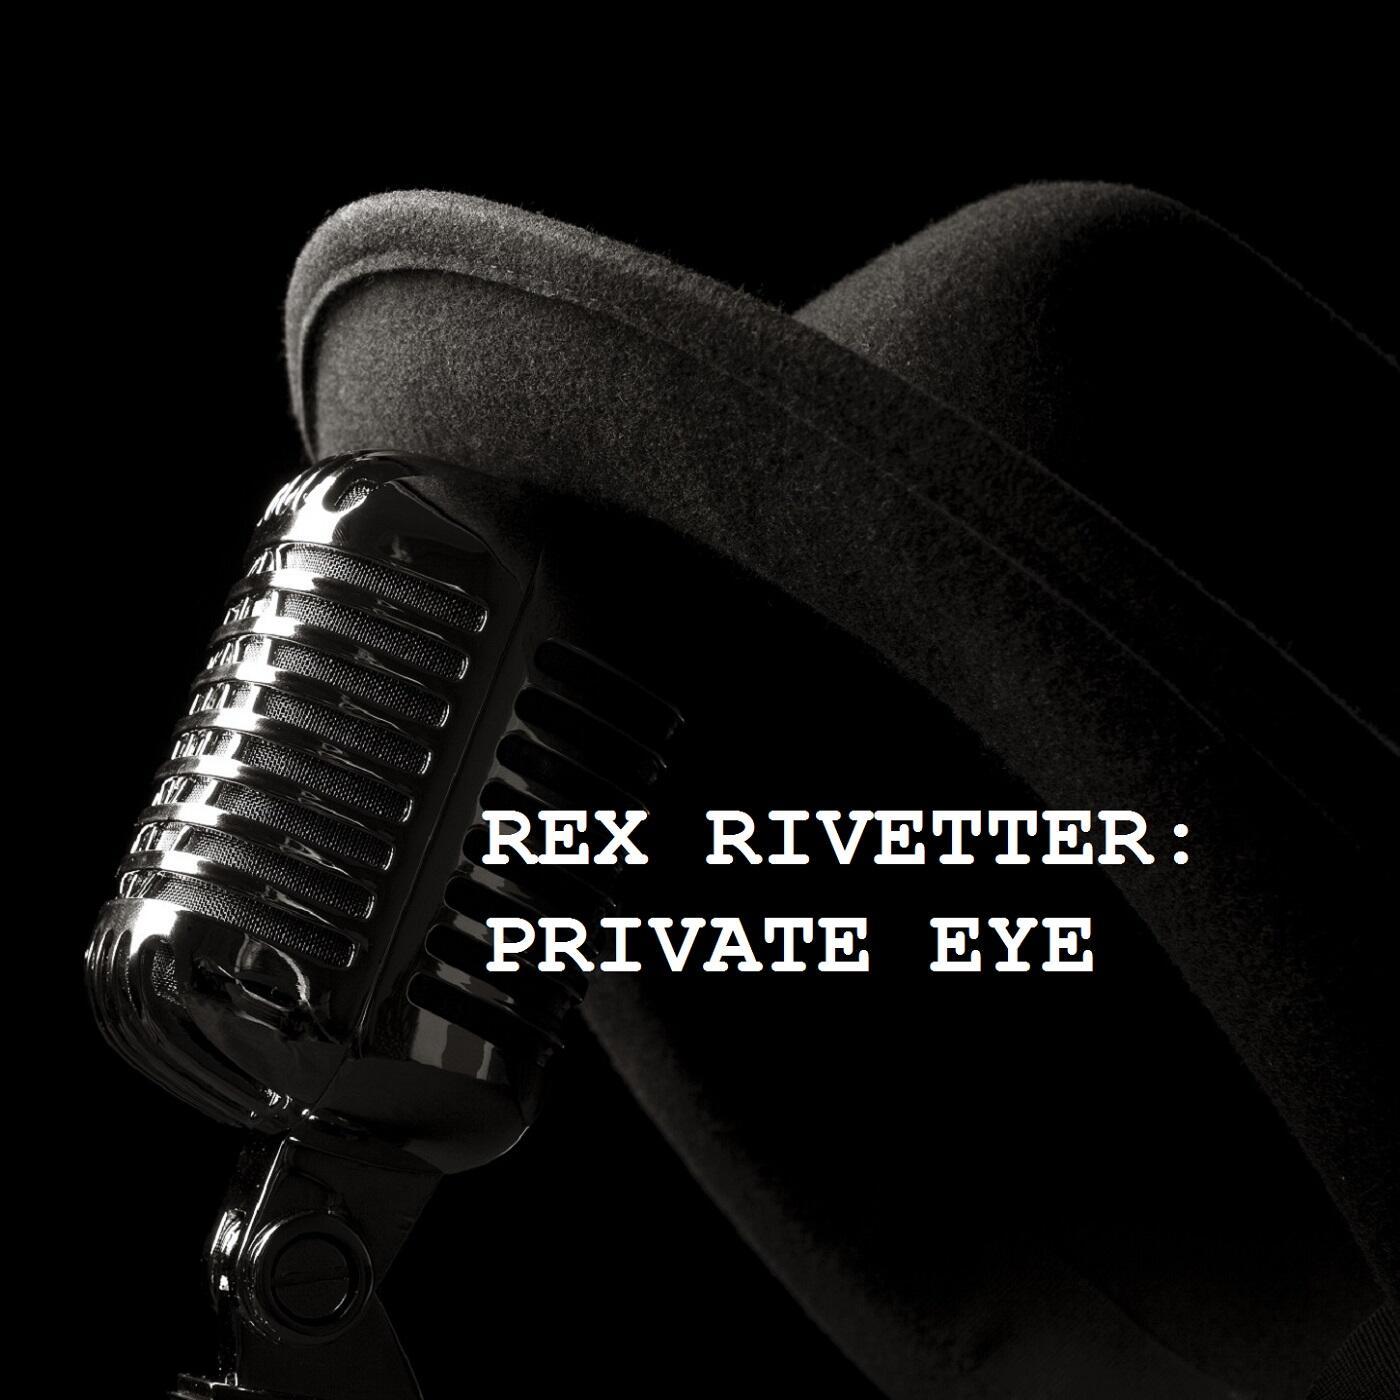 Rex Rivetter: Private Eye